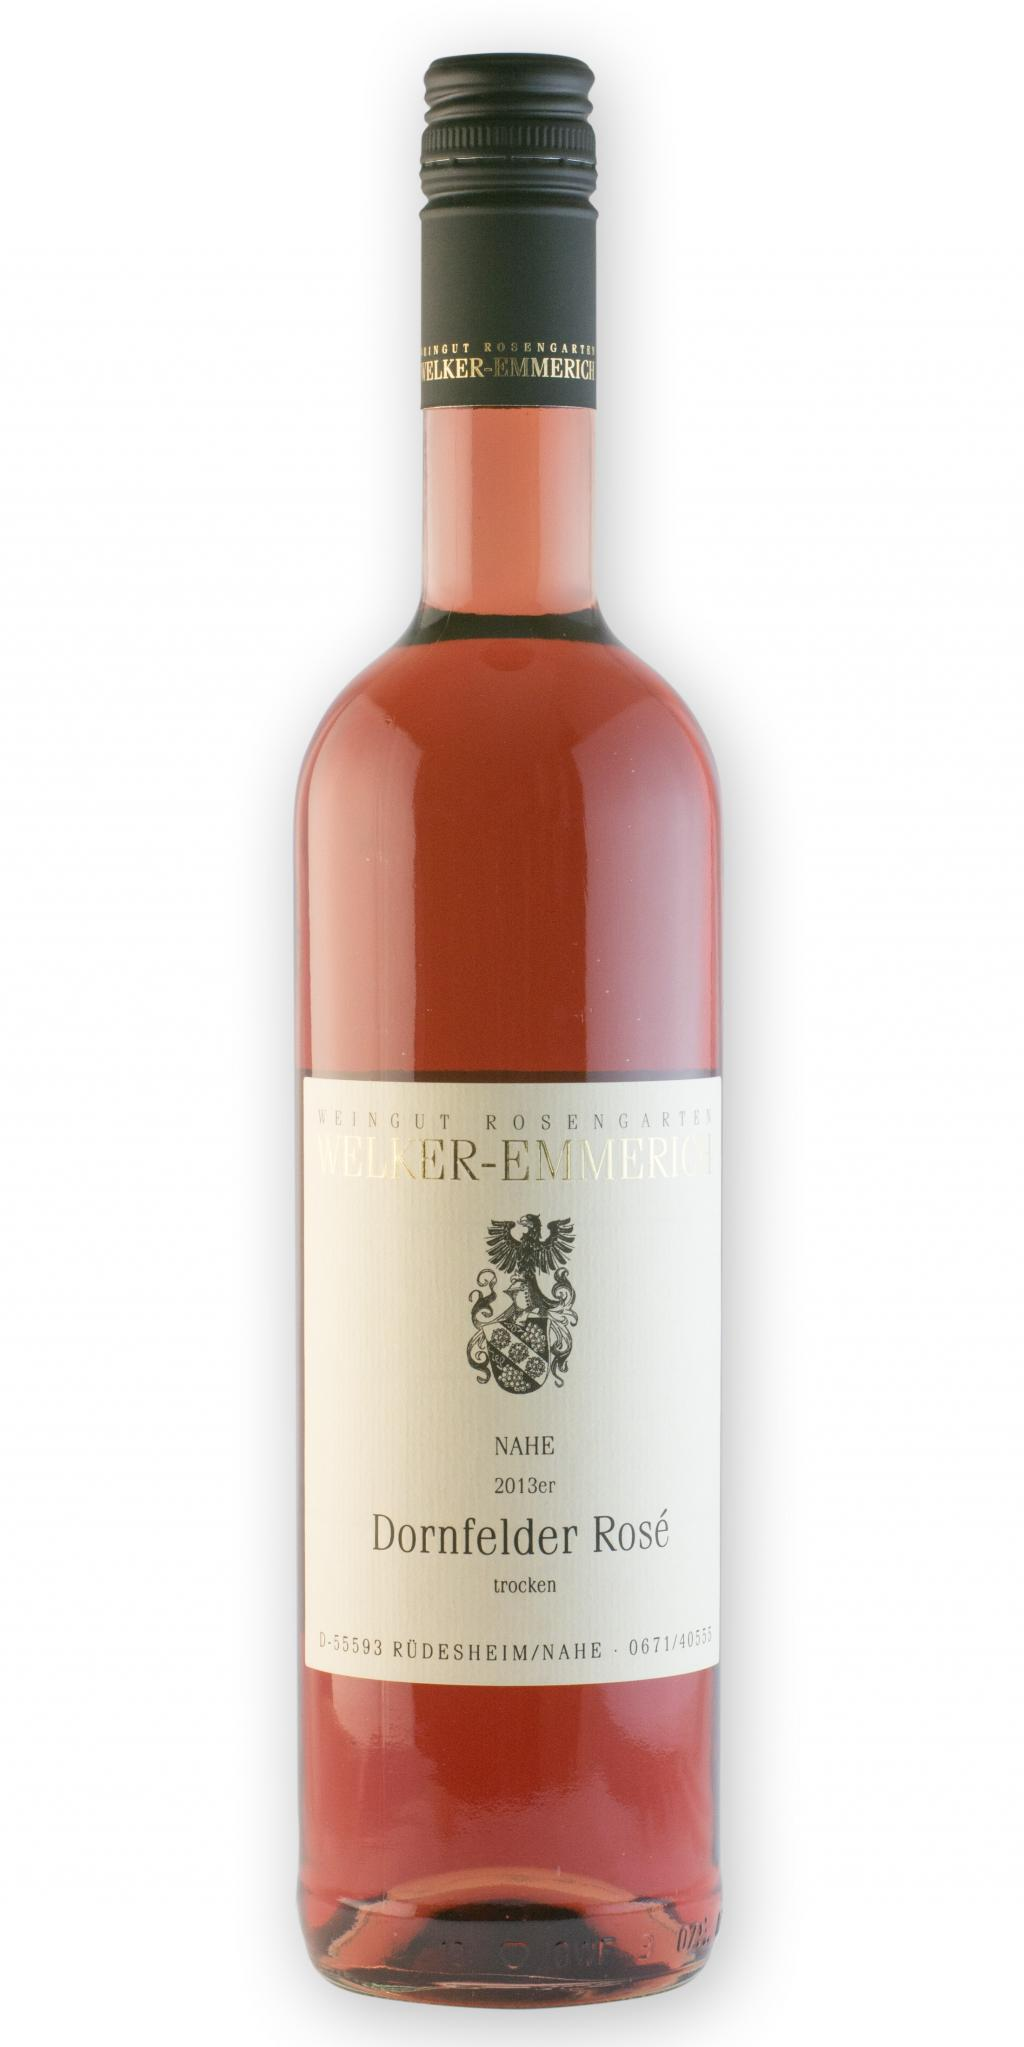 Dornfelder Rosé trocken 2015 / Welker-Emmerich